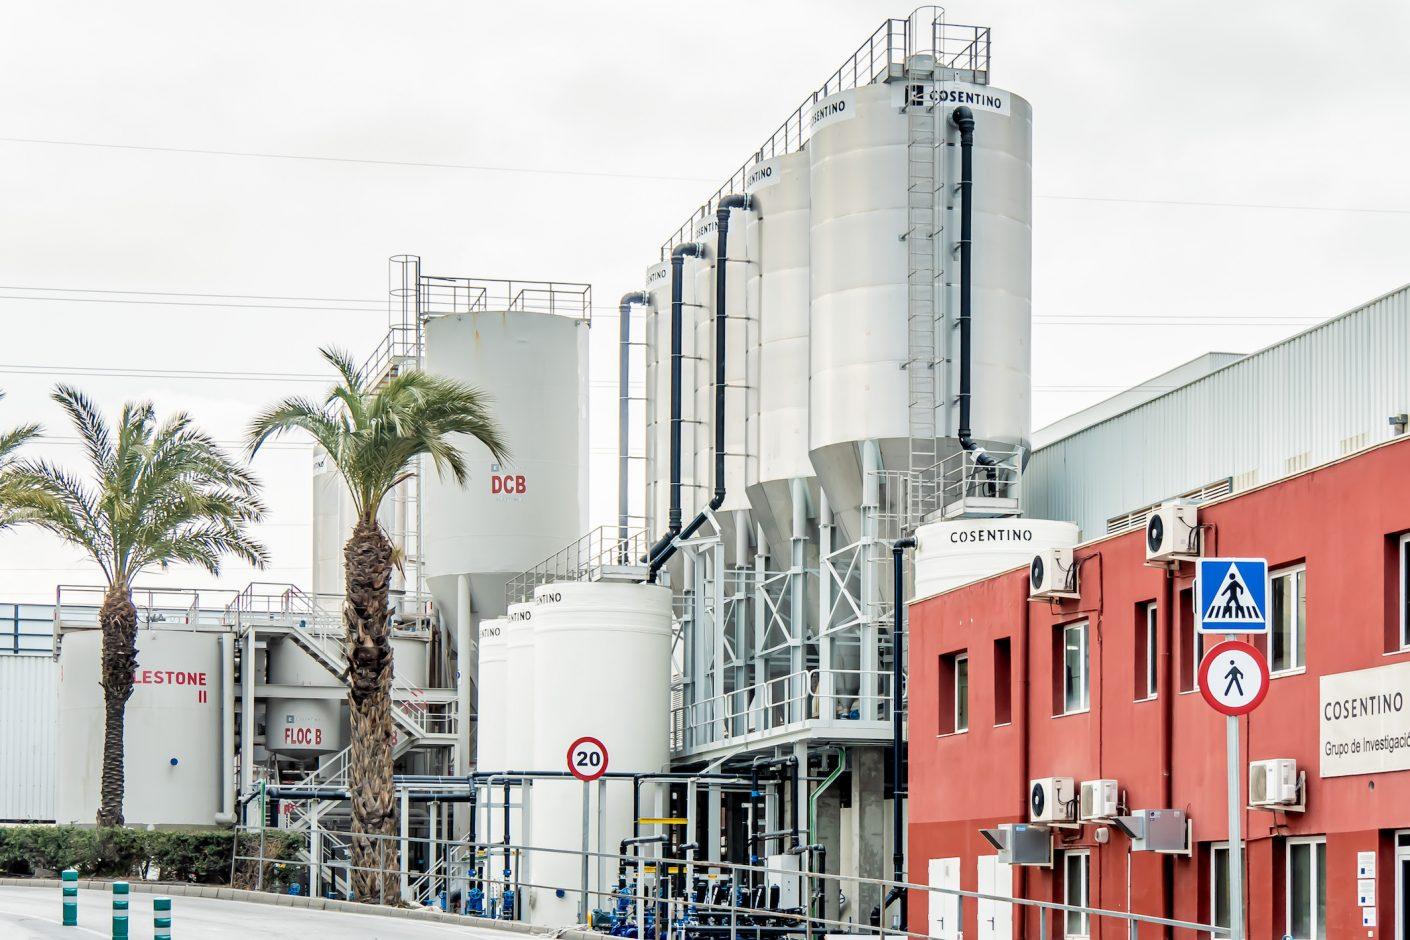 Der Cosentino Industrial Park in Cantoria, Südspanien. Quelle: Cosentino